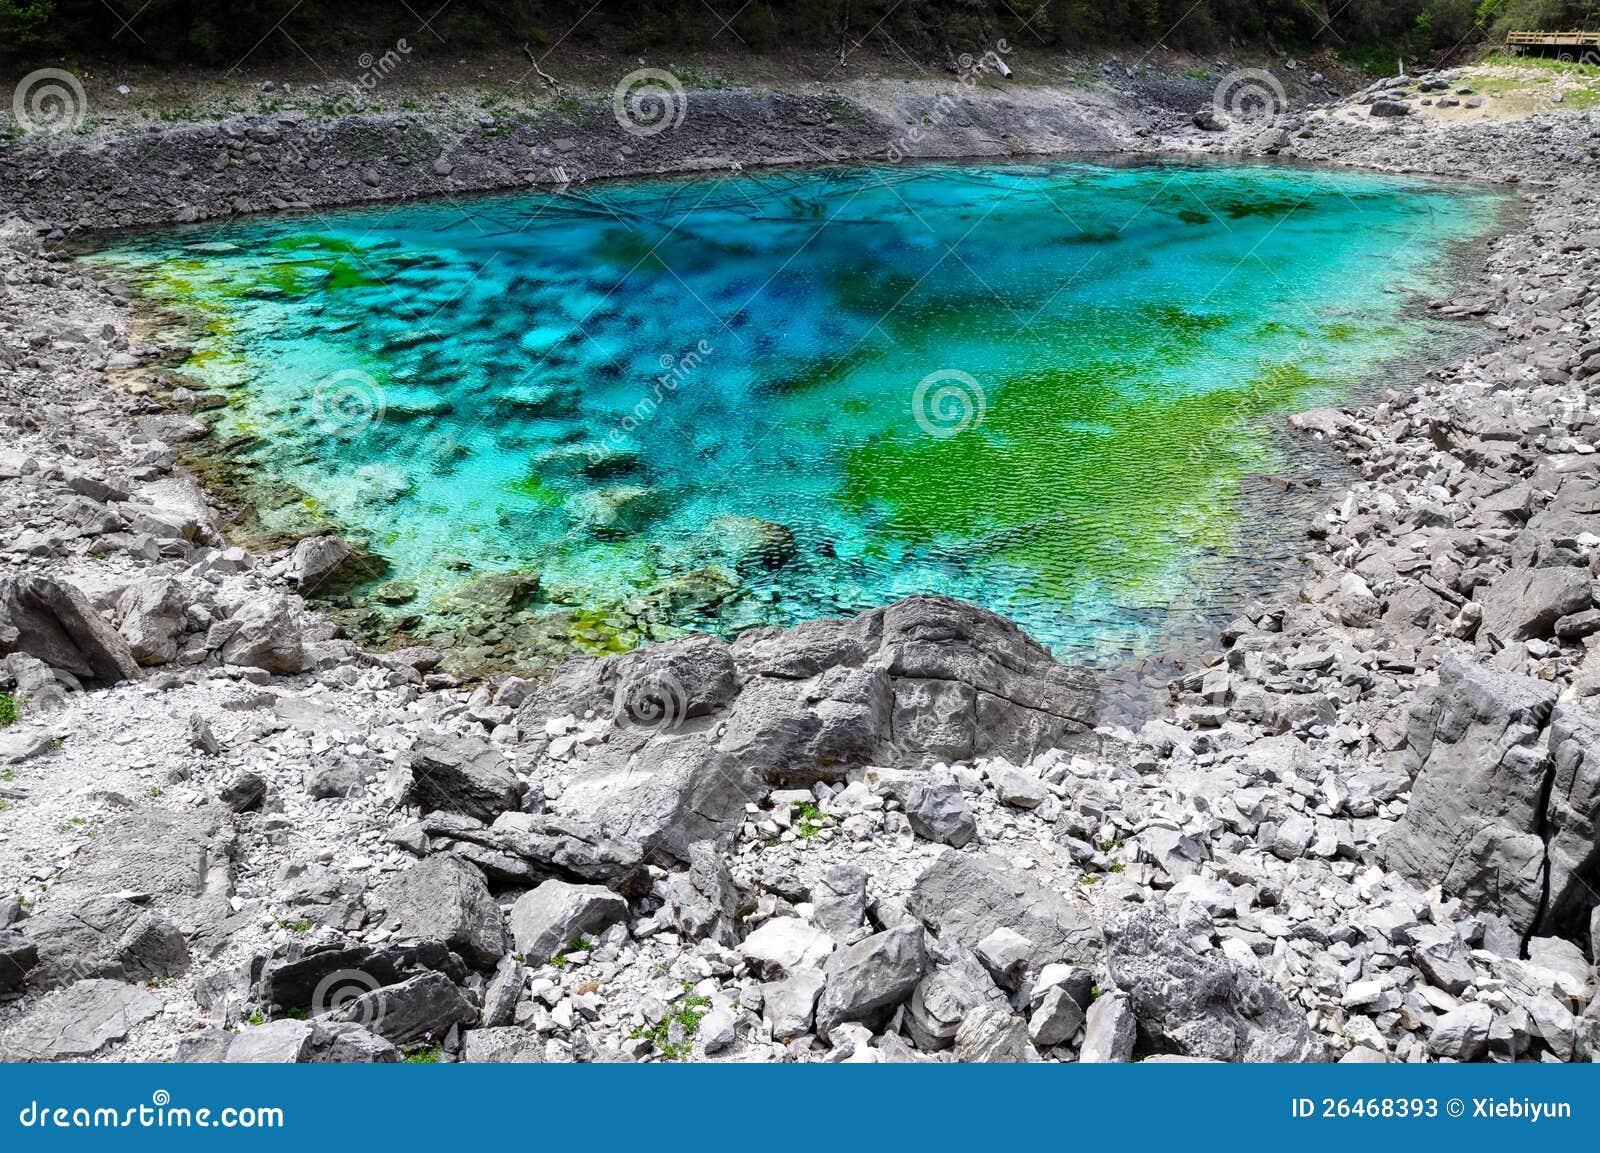 five color pond at jiuzhaigou sichuan china stock On color pond